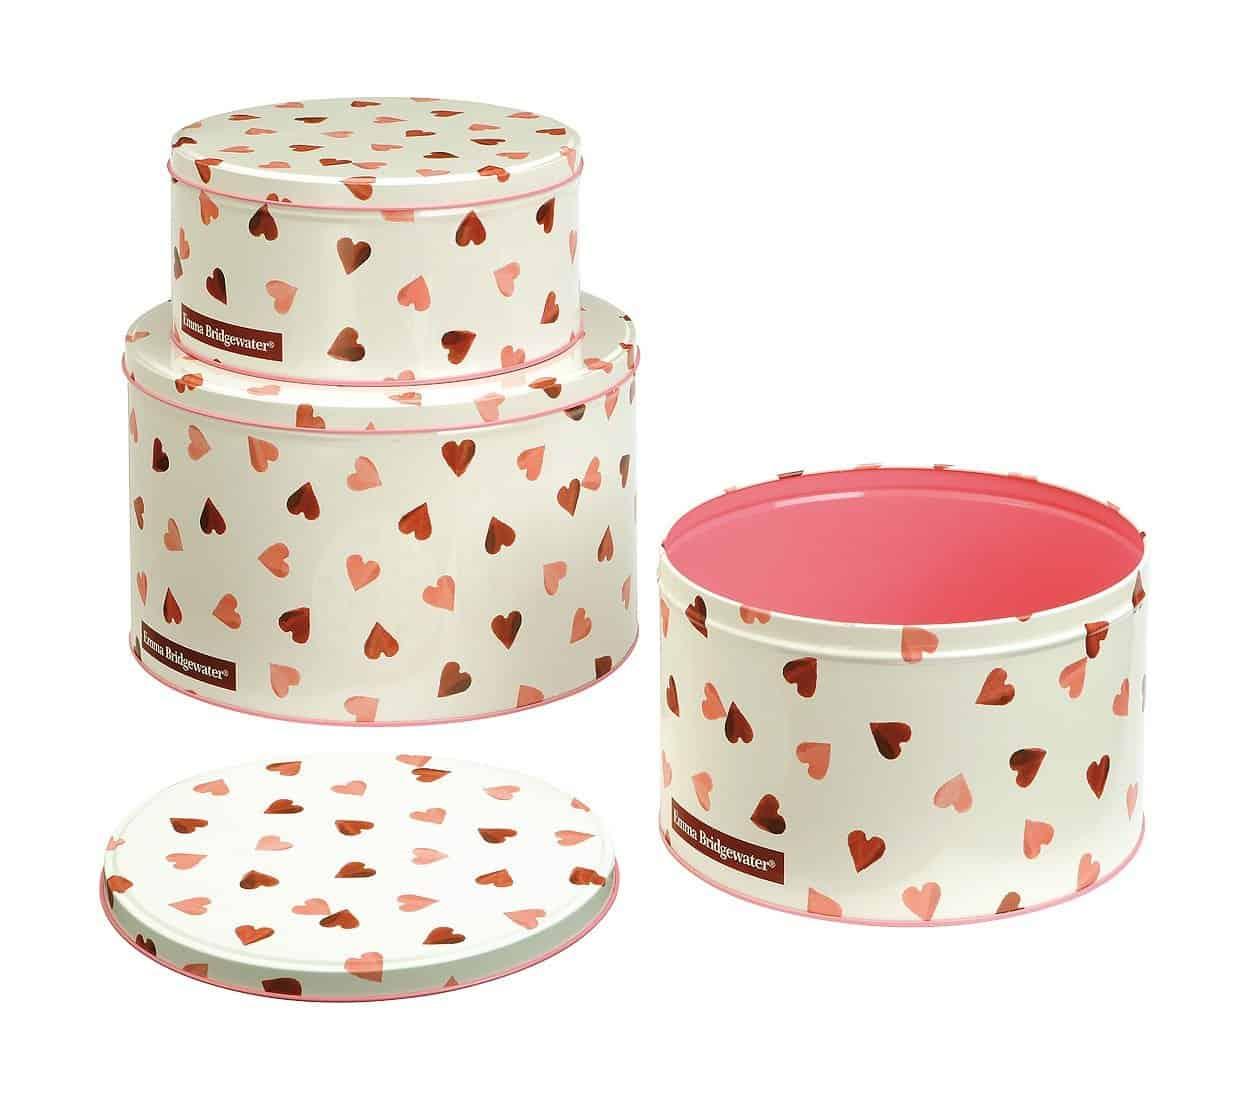 Mini Round Cake Tins